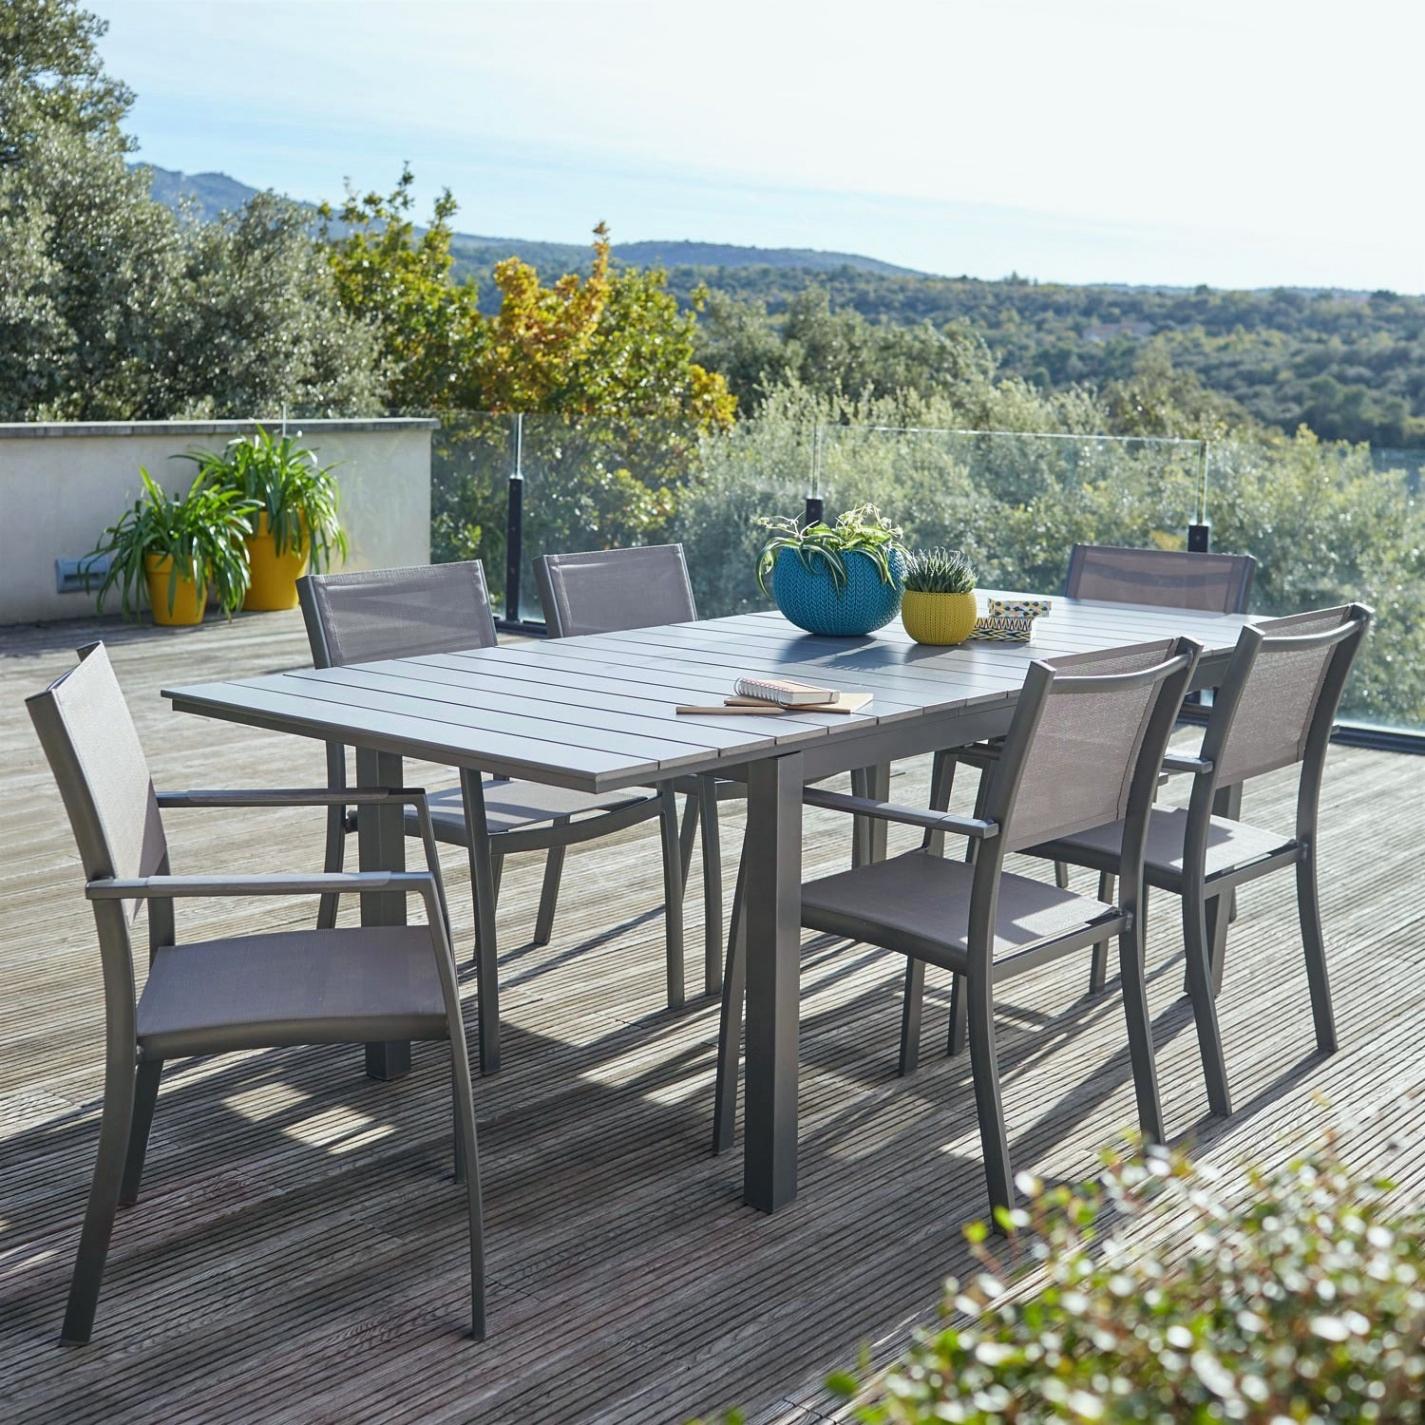 table basse jardin castorama inspire salon jardin metal table et fauteuils chaise violet castorama en pas of table basse jardin castorama